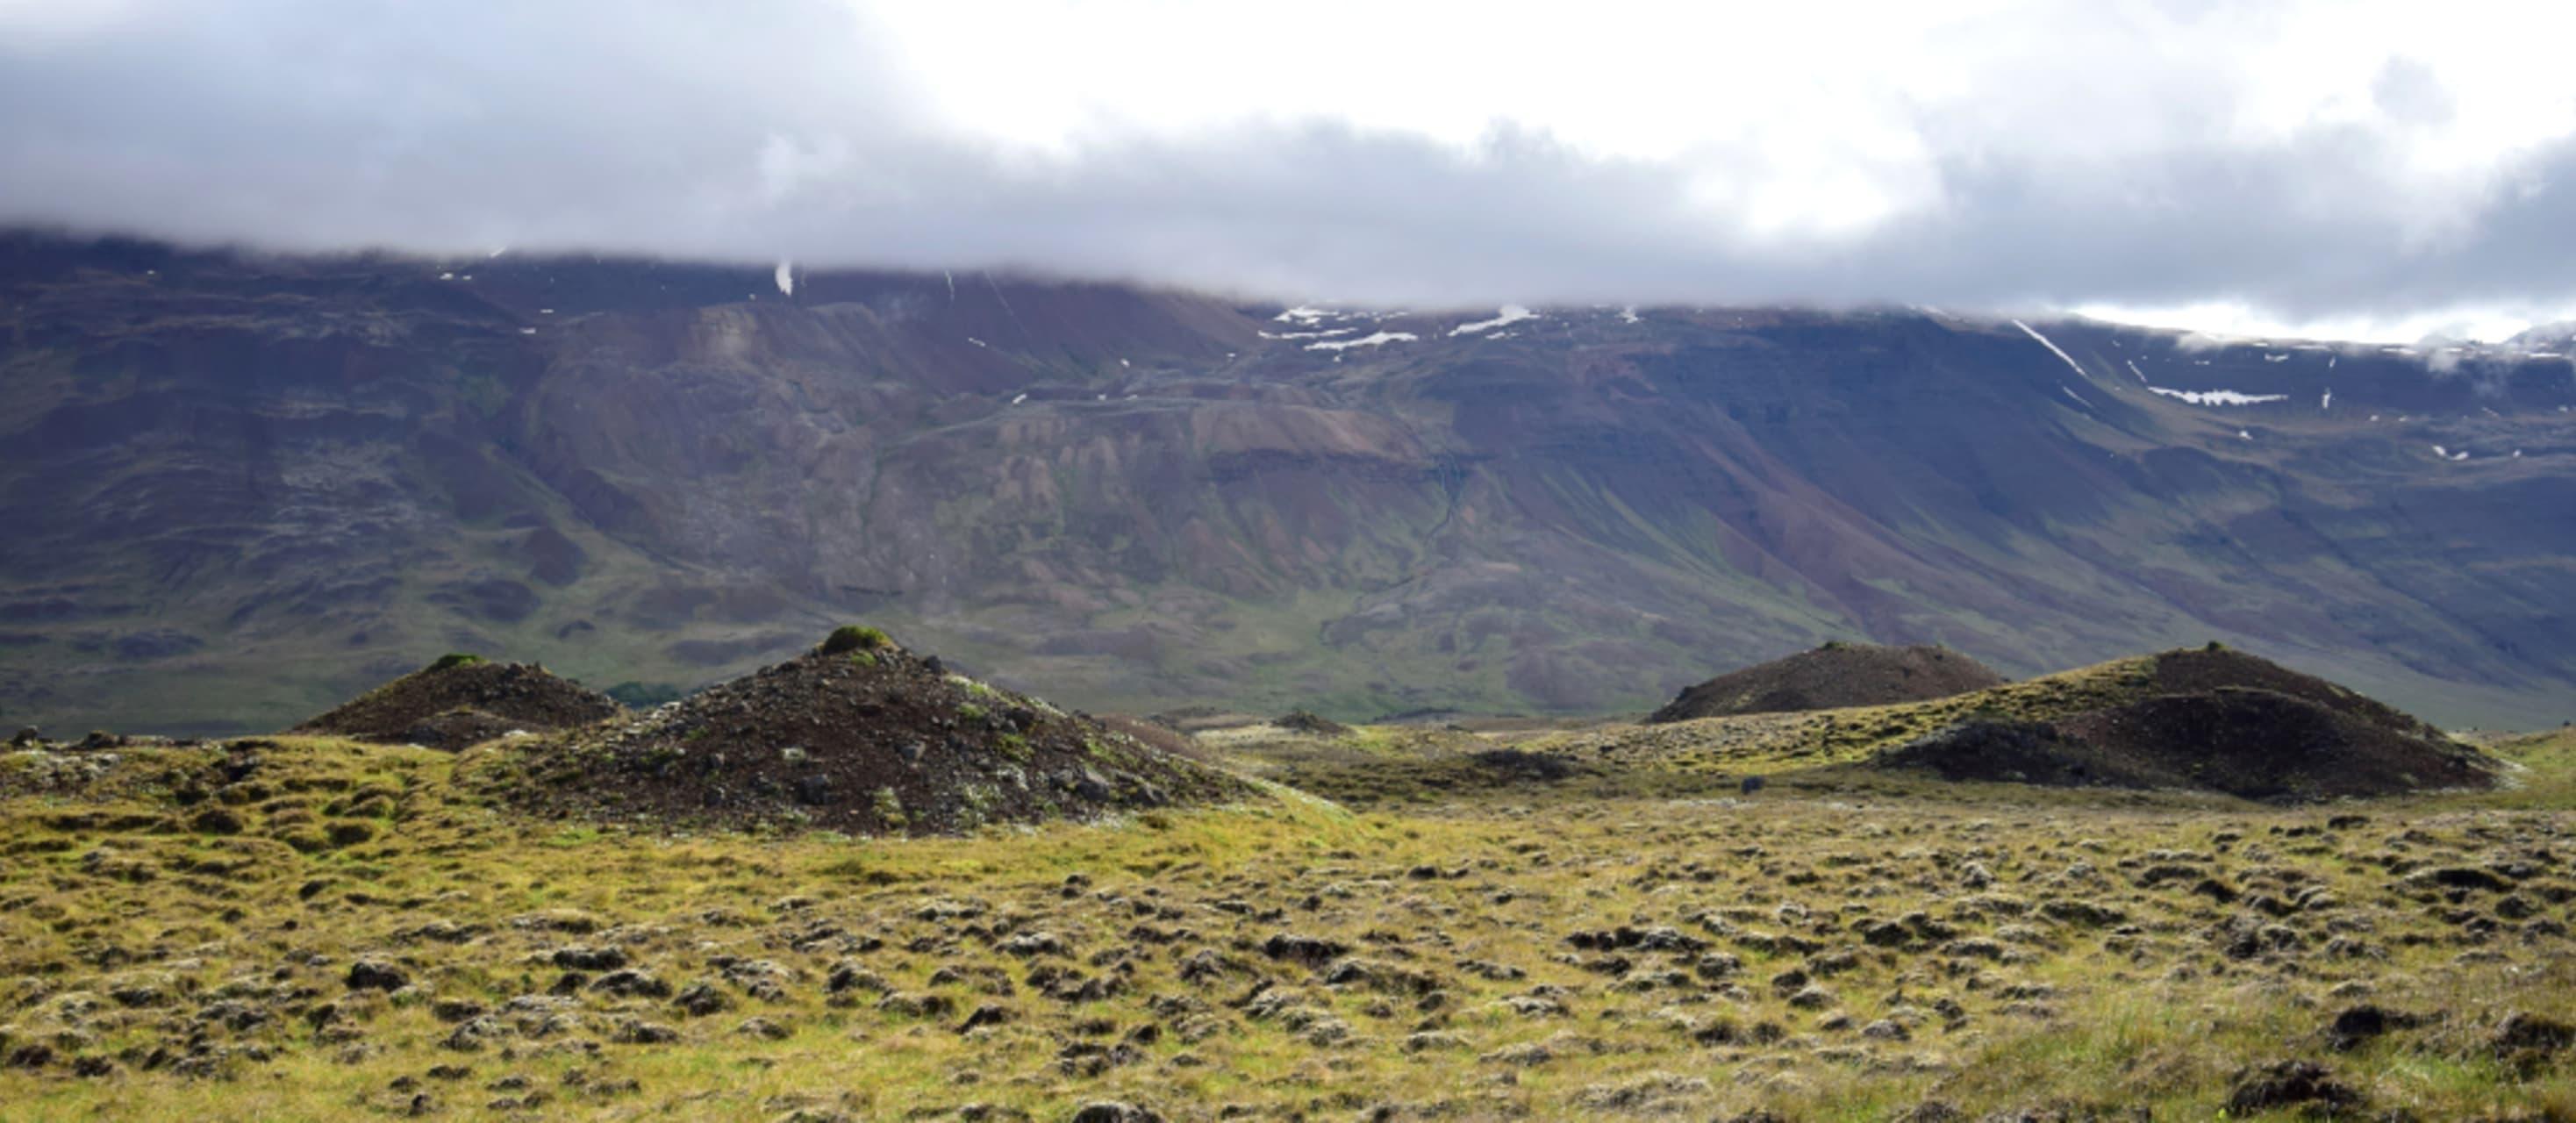 North Iceland - Vatnsdalsholar Hills, Legends and more recent discoveries